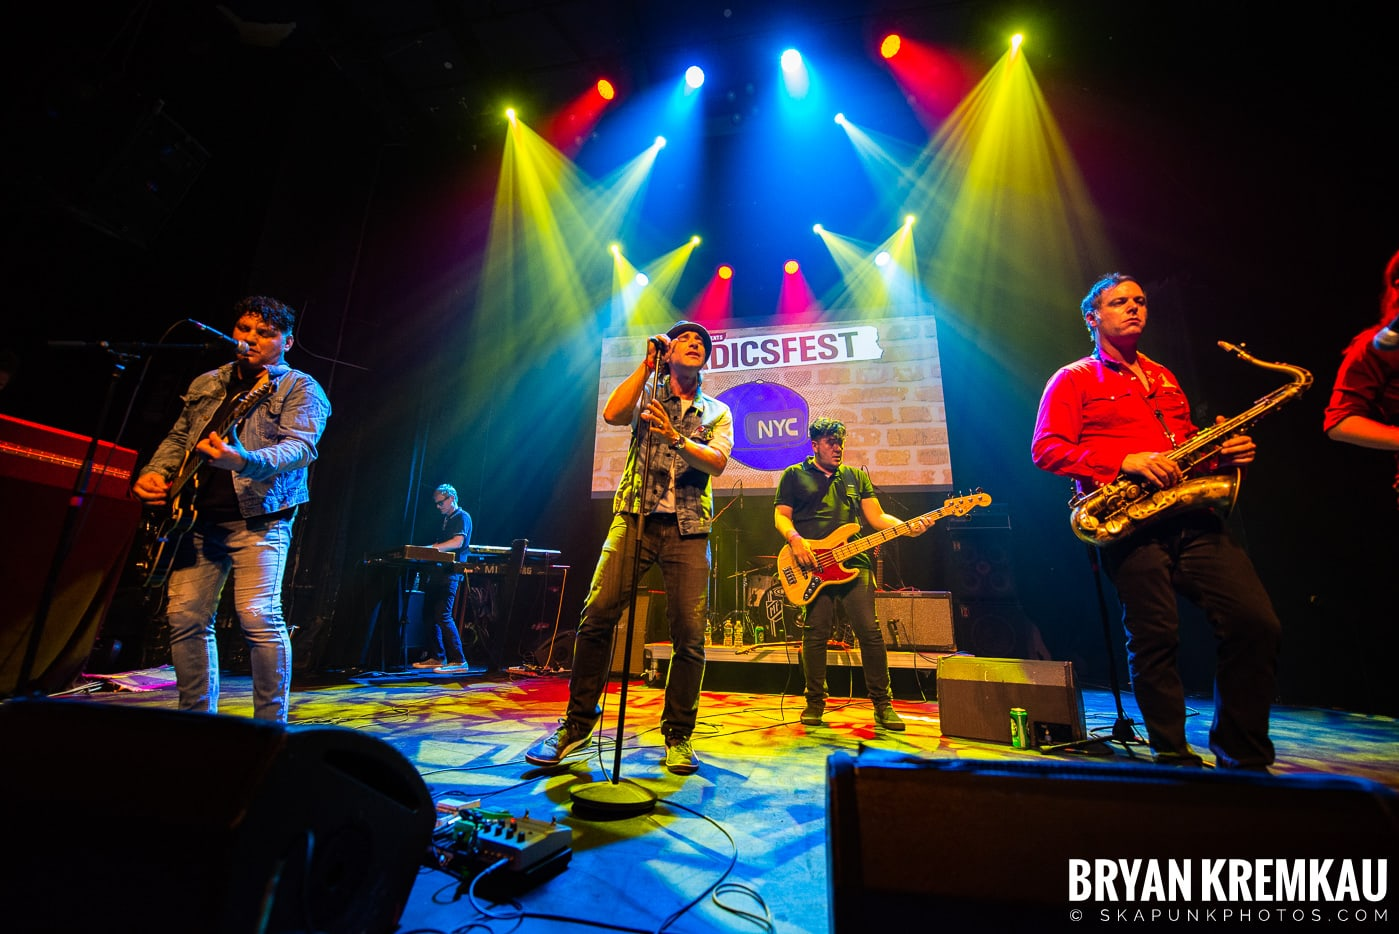 Spring Heeled Jack @ Radicsfest, Gramercy Theatre, NYC - 7.19.19 (22)